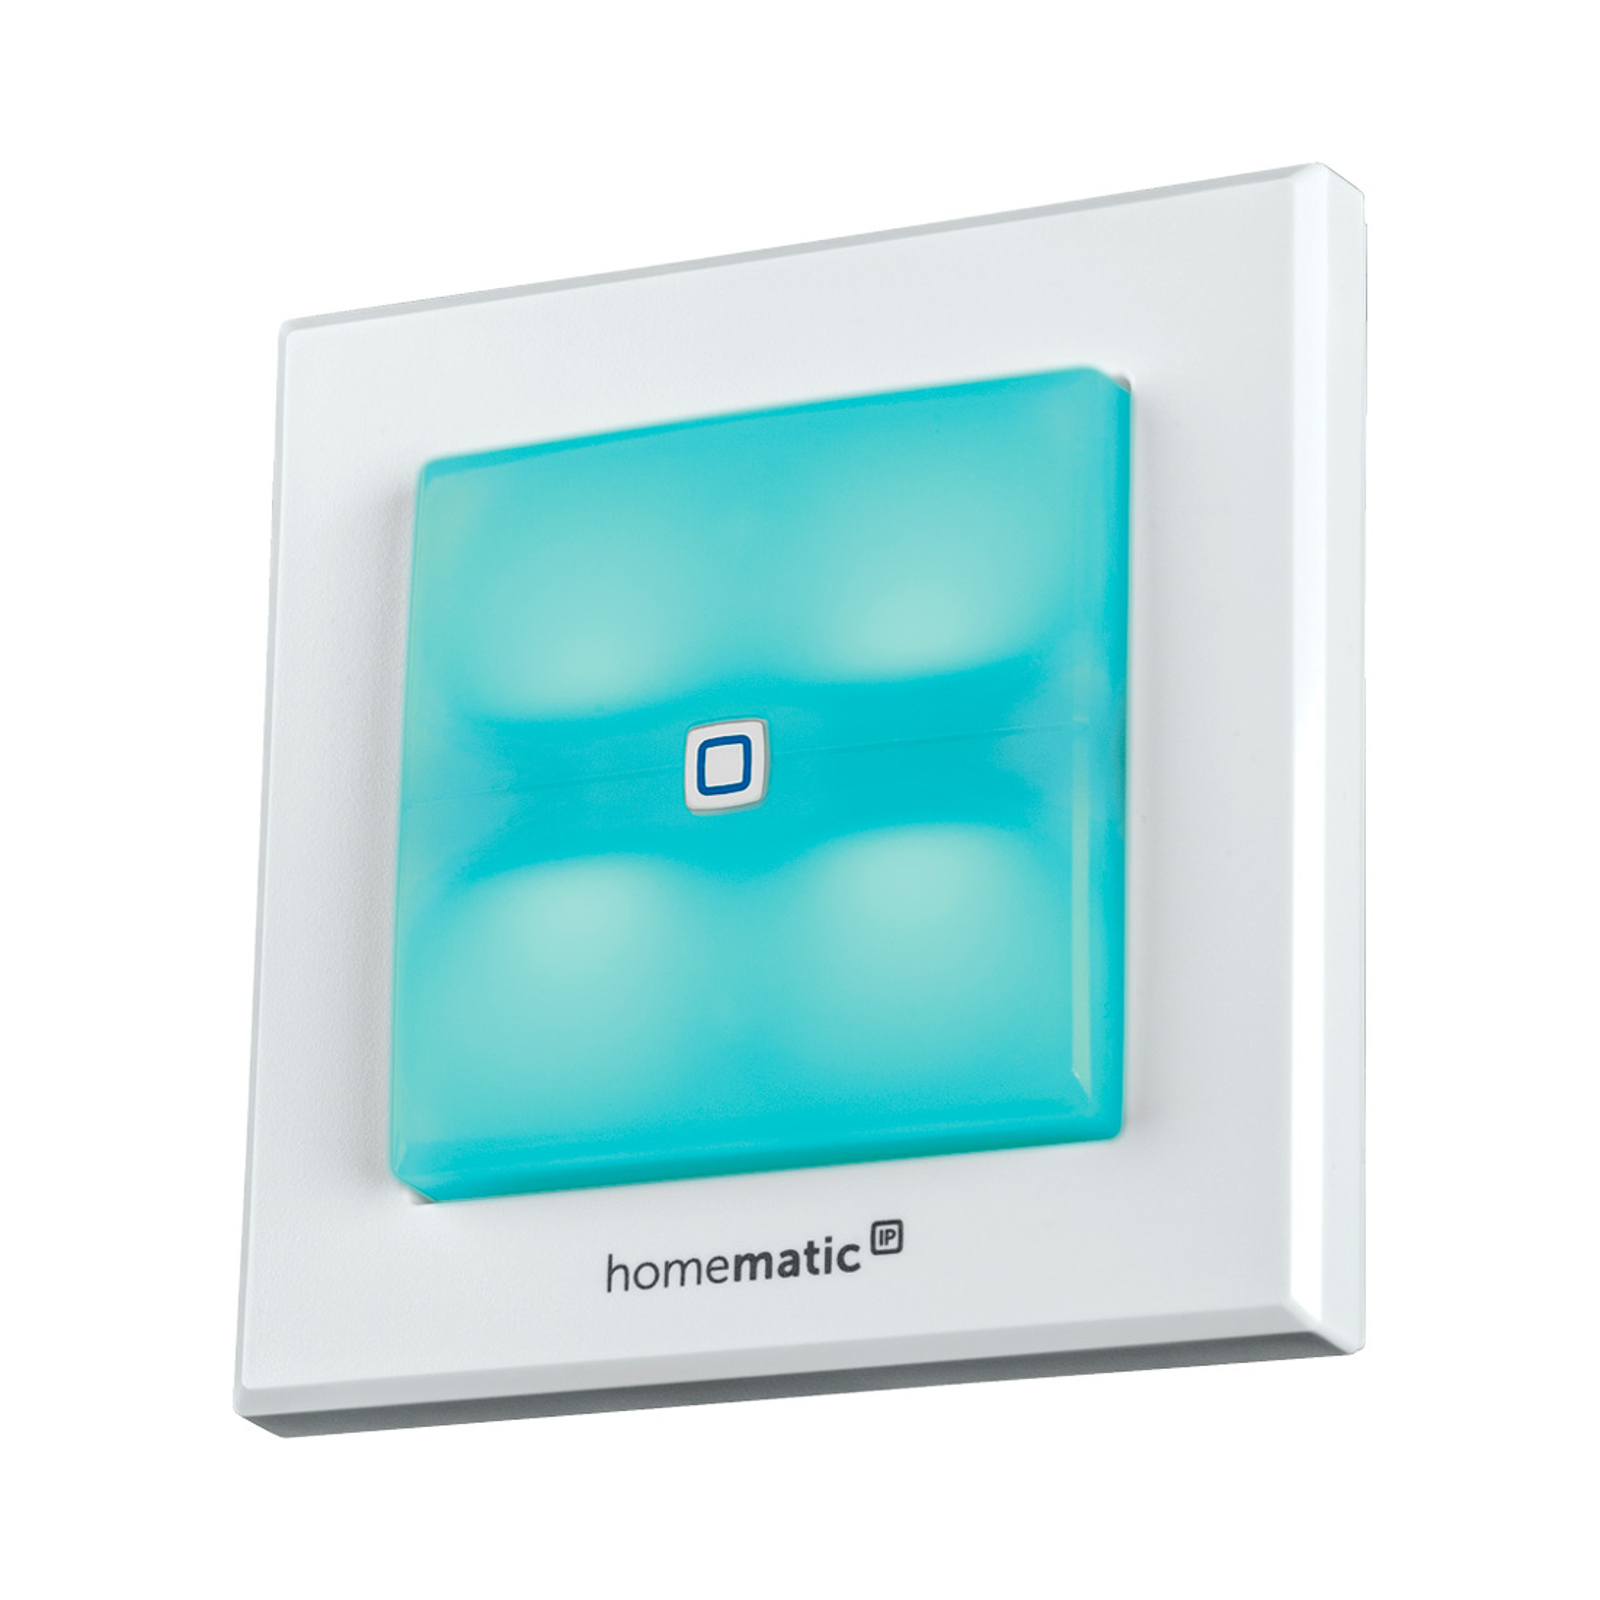 Homematic IP skifteaktuator med signallampe